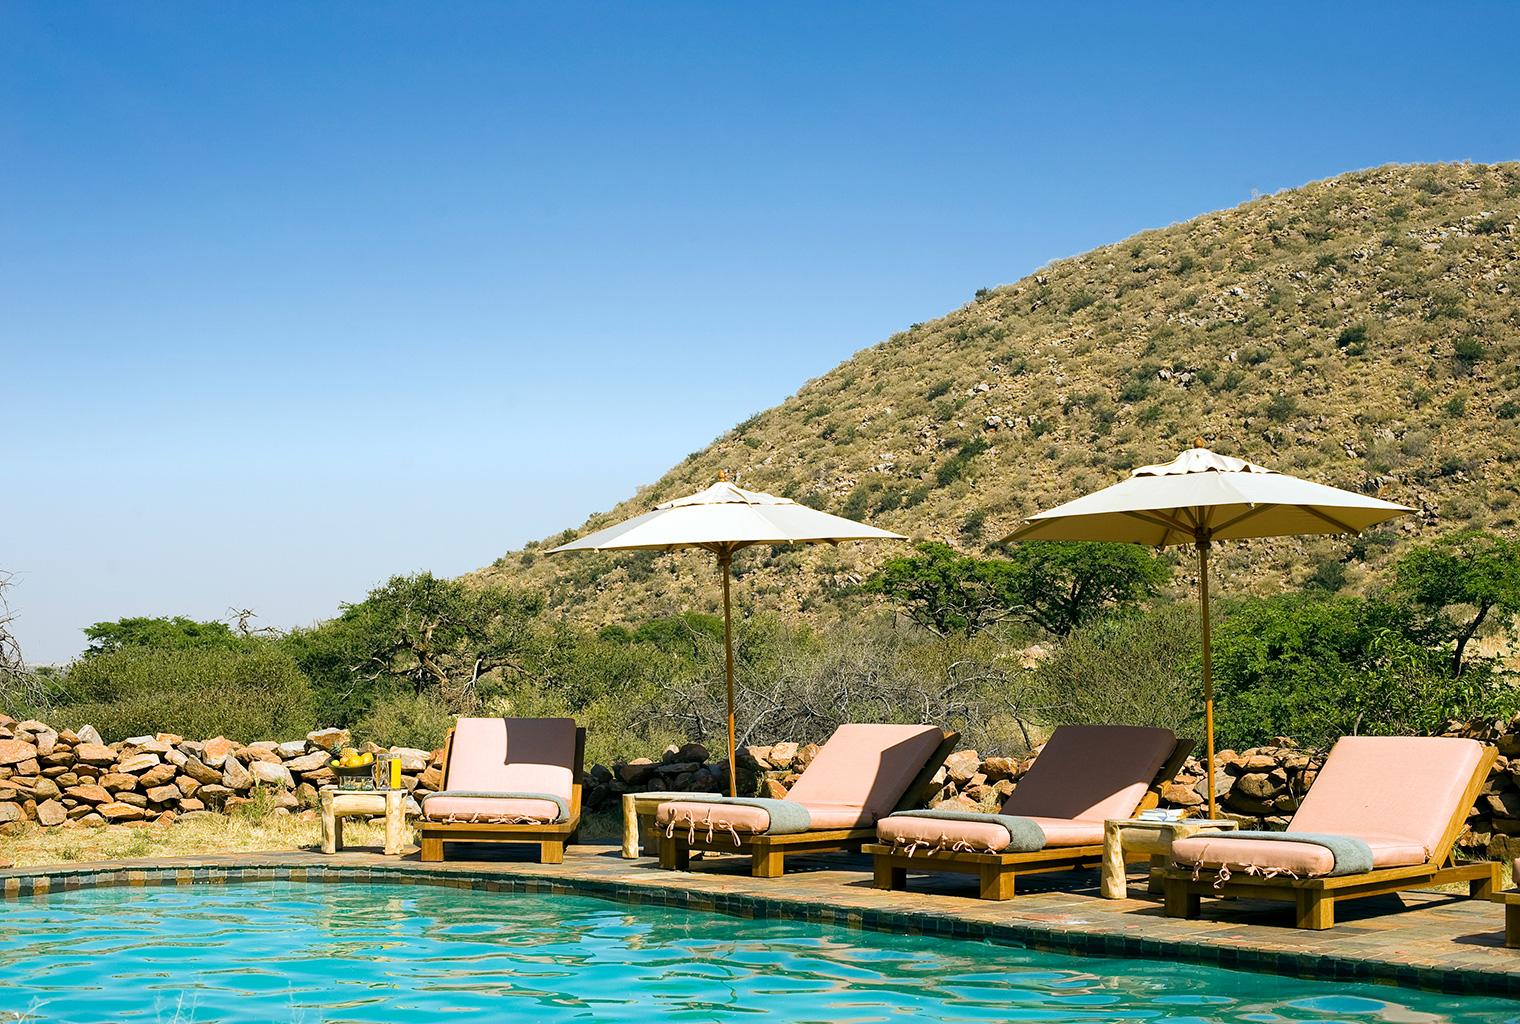 Tarkuni-South-Africa-Pool